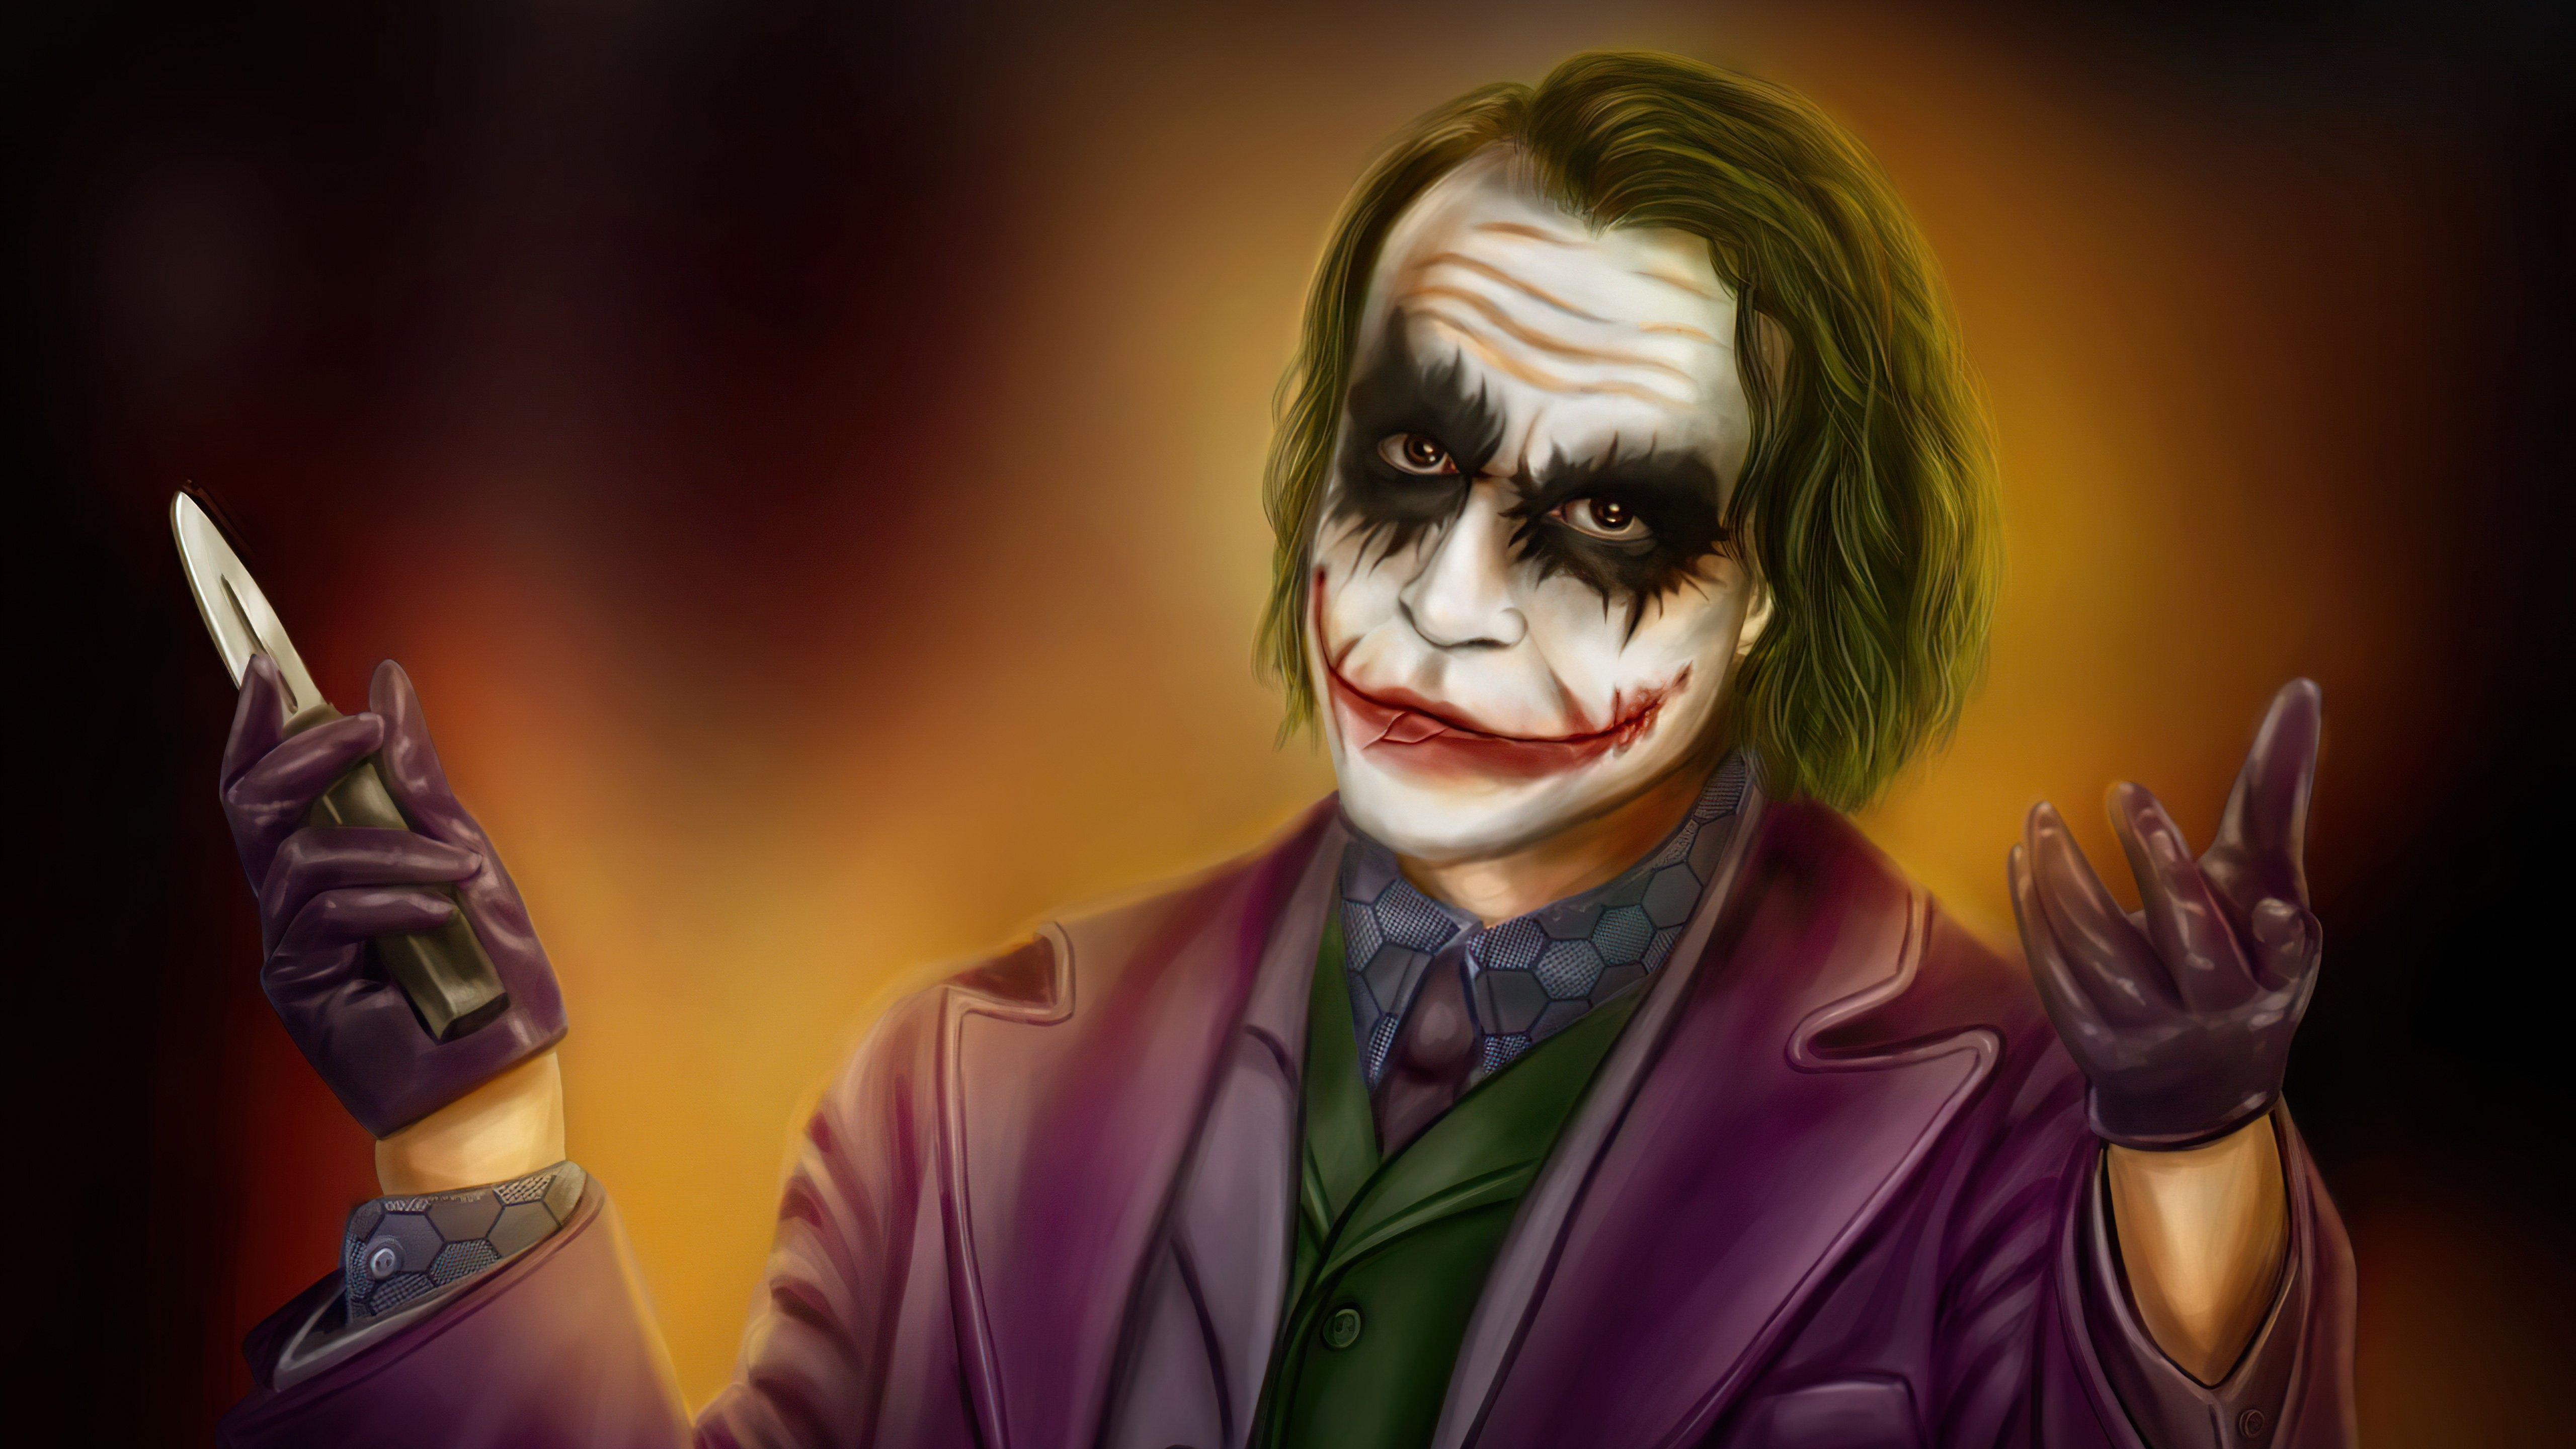 Wallpaper Let it Burn Joker